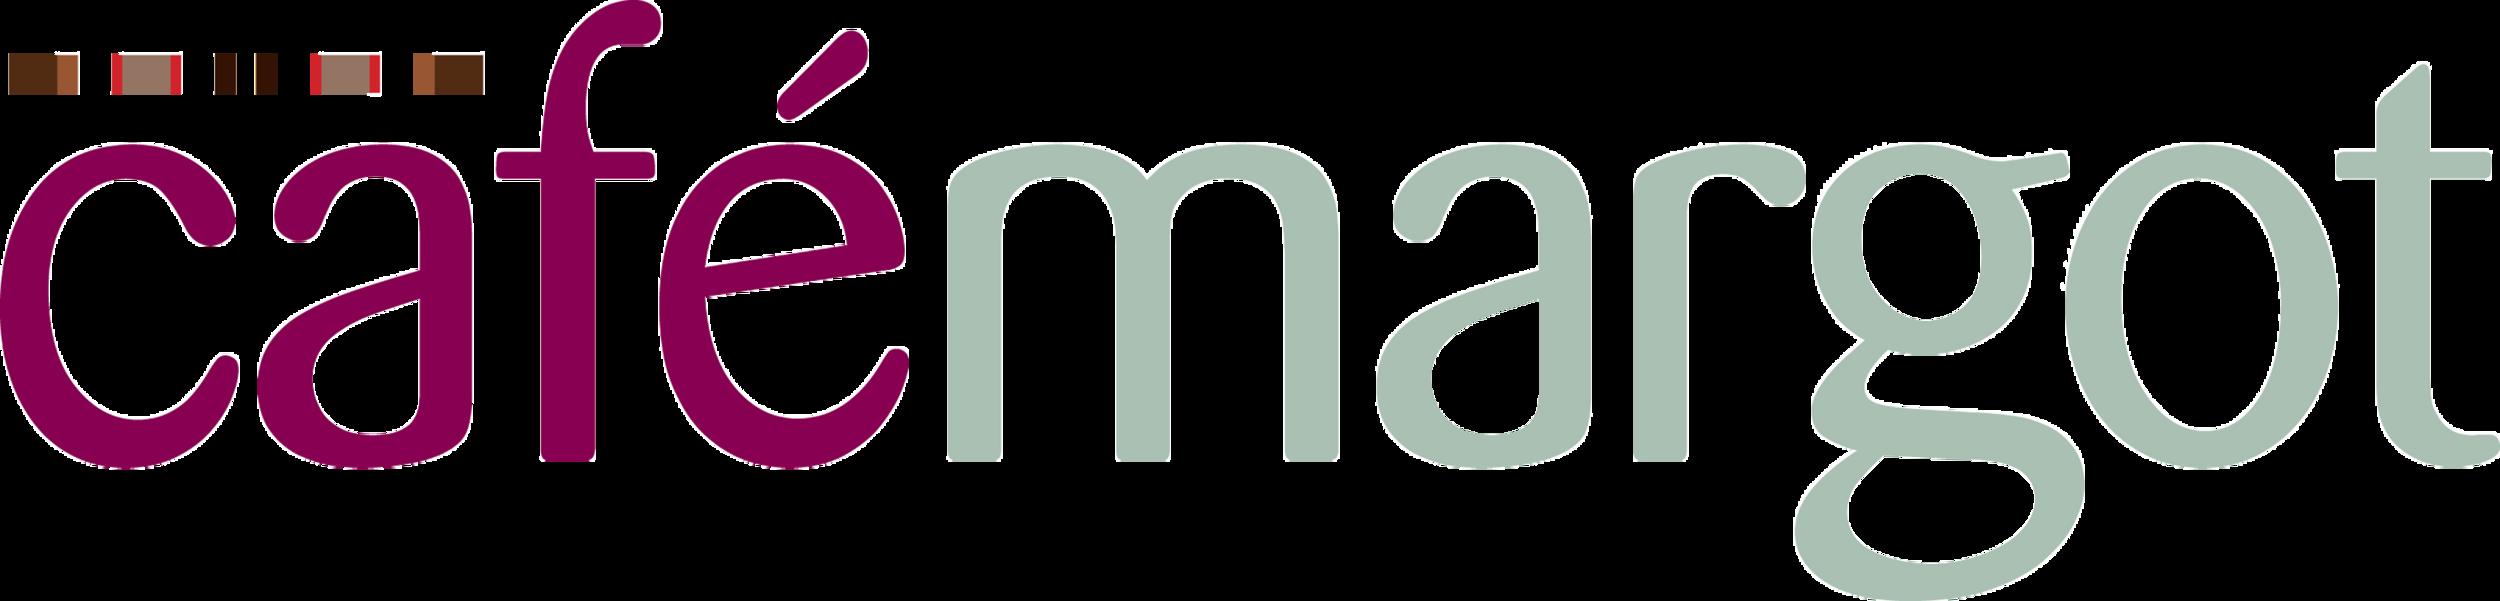 Cafe Margot Logo-3.png